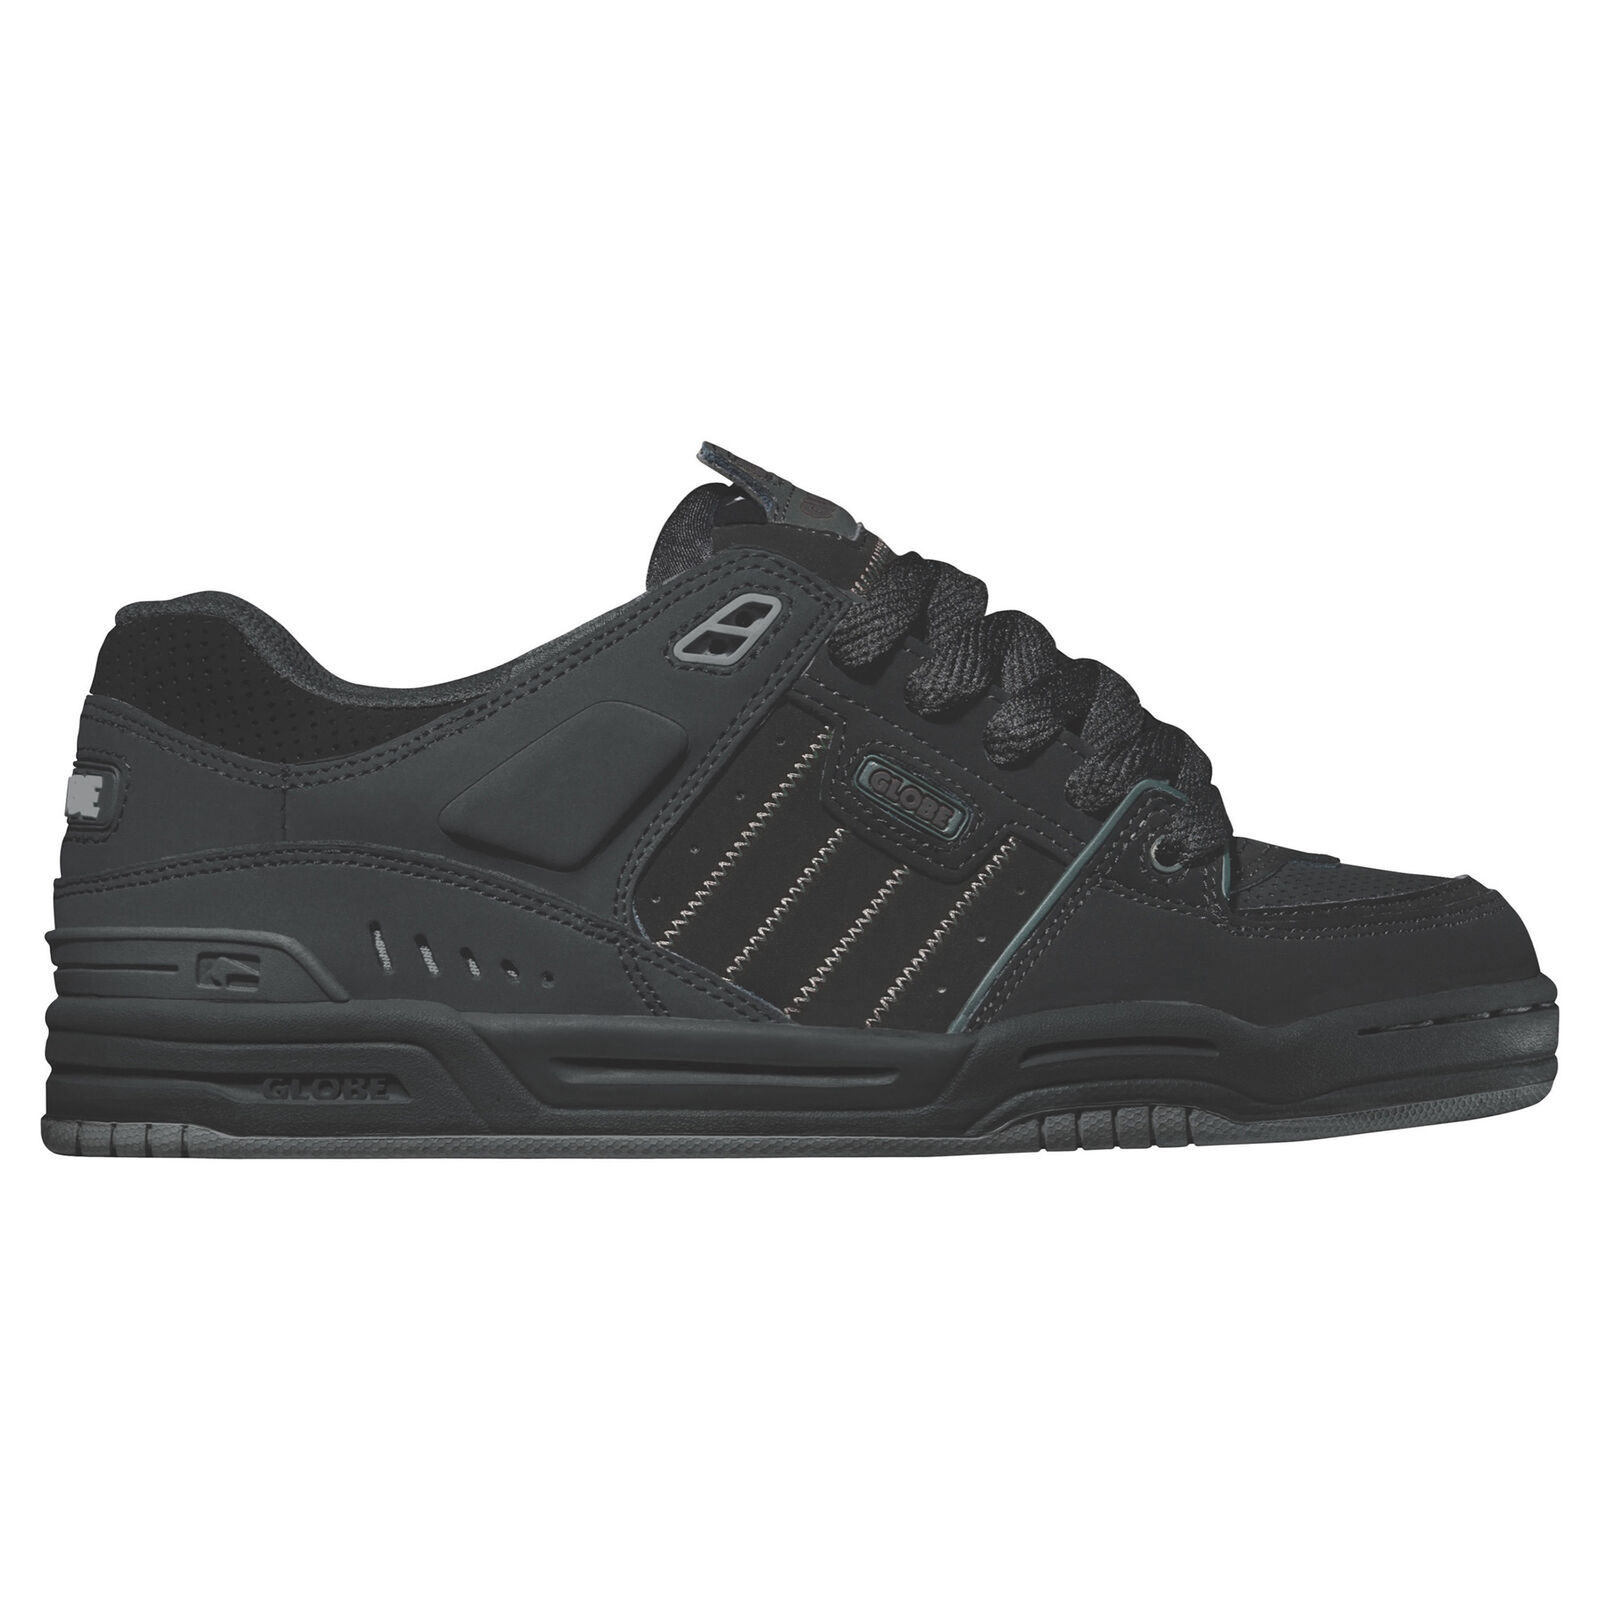 GLOBE NEW Mens Fusion Shoes Black/Night BNWT